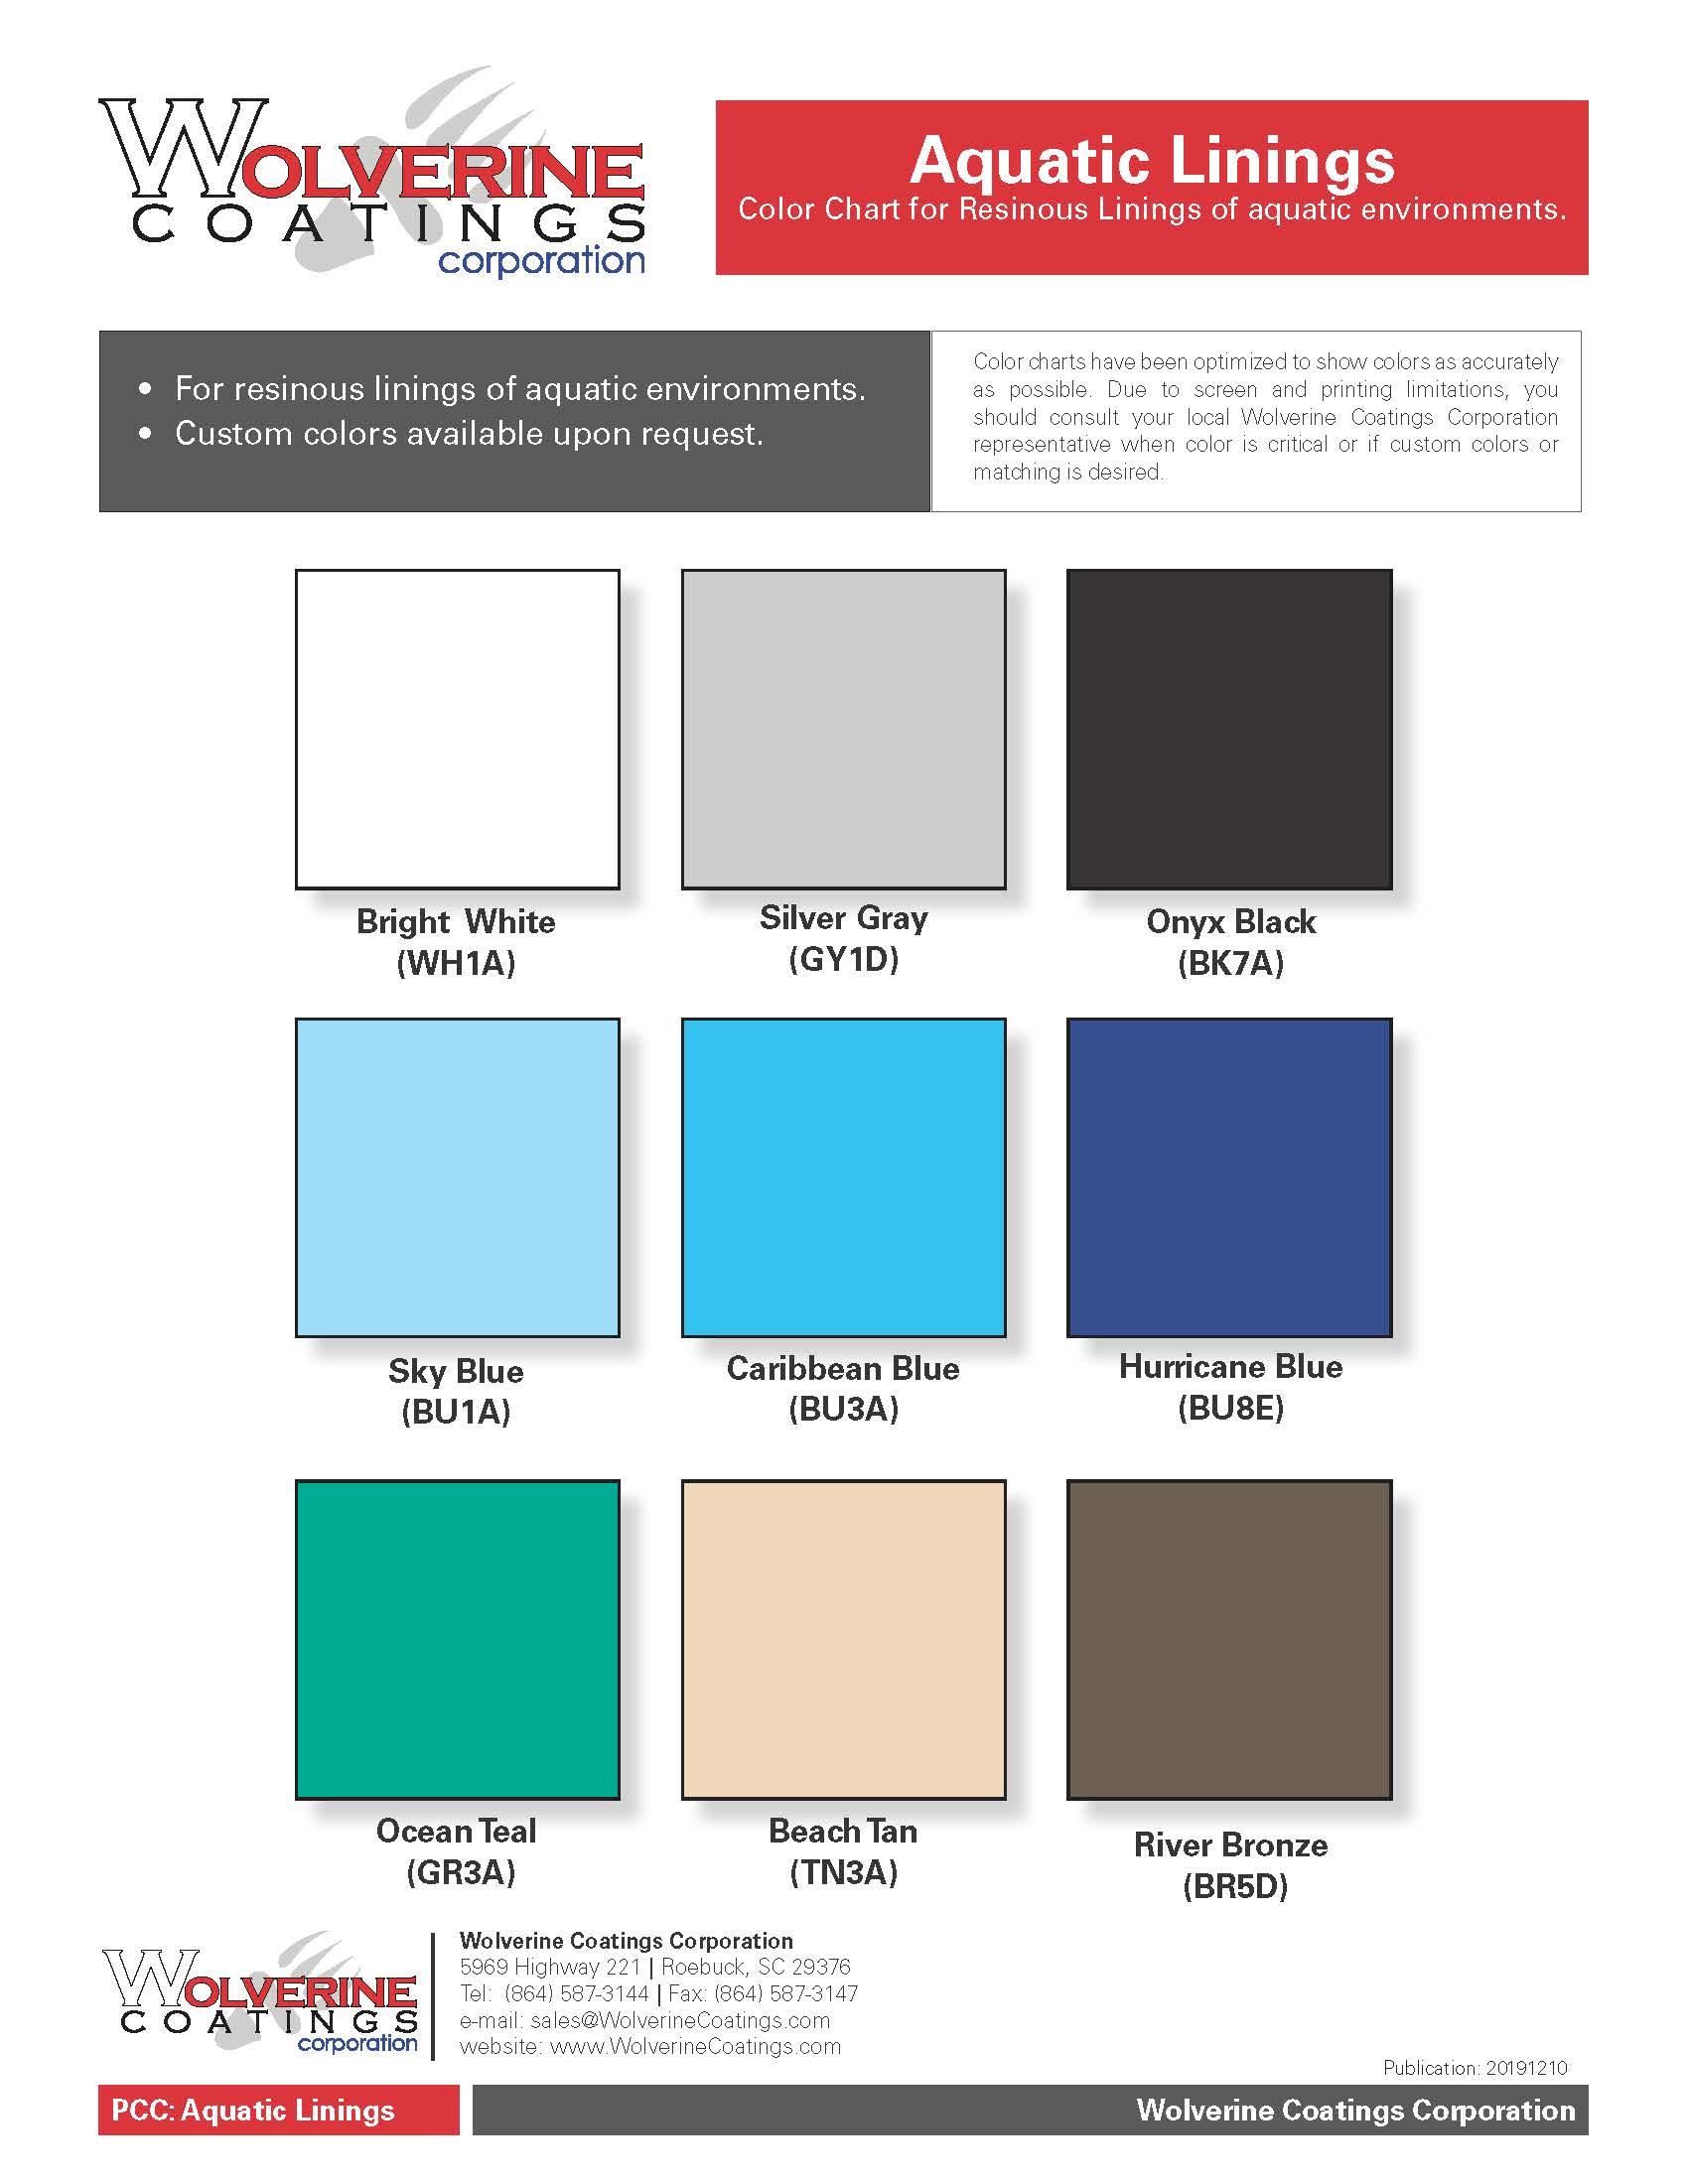 Aquatic Linings Color Chart-PCC